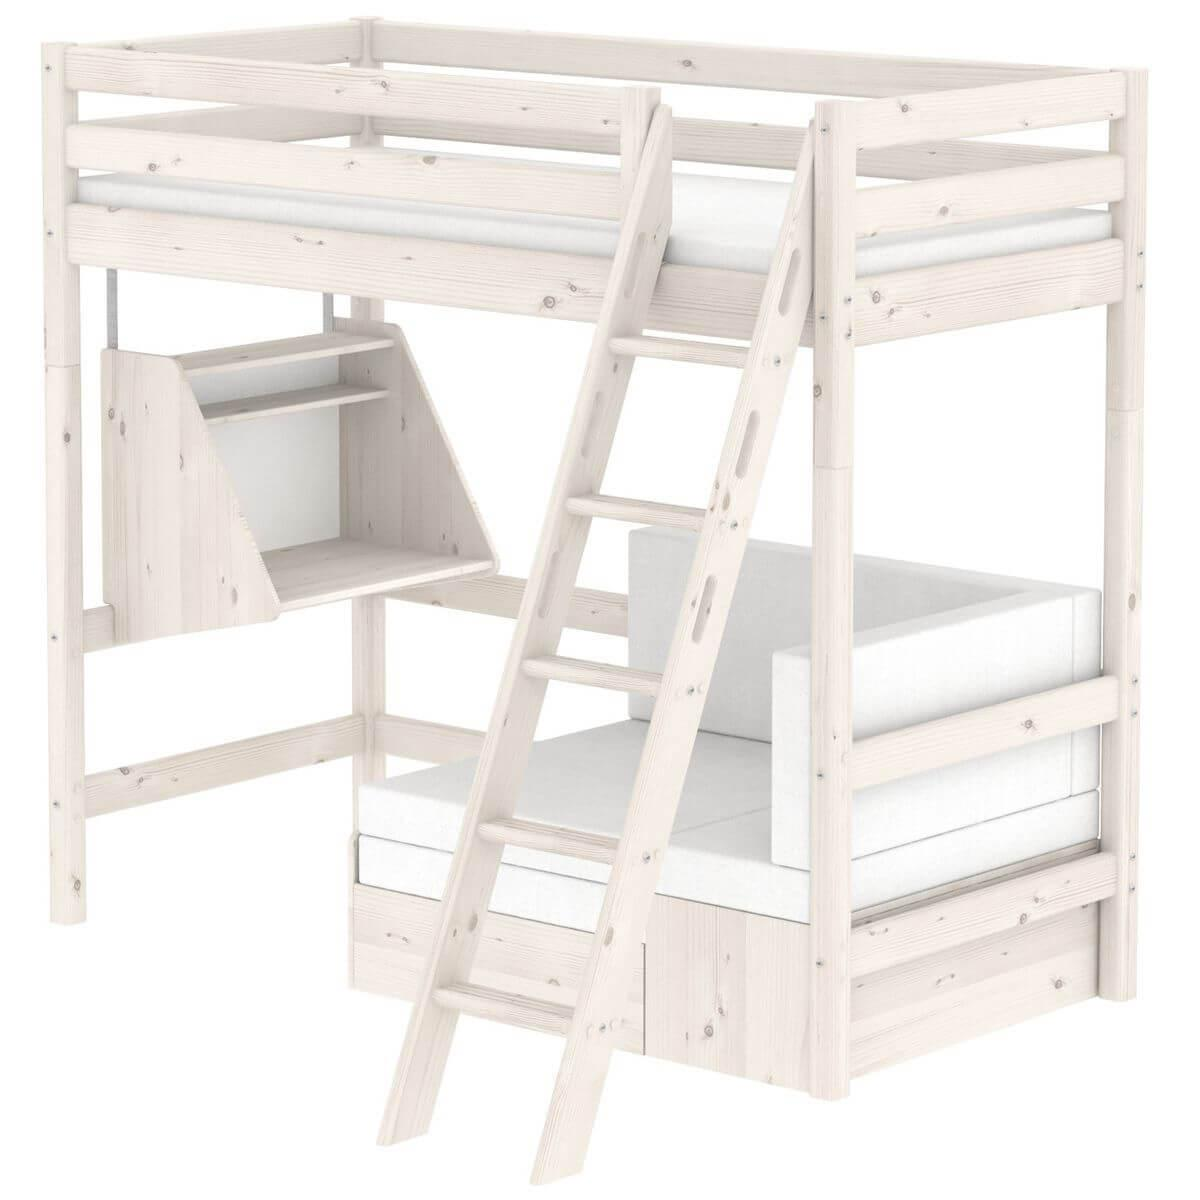 Cama alta Casa 90x190 CLASSIC Flexa escalera inclinada blanco cal